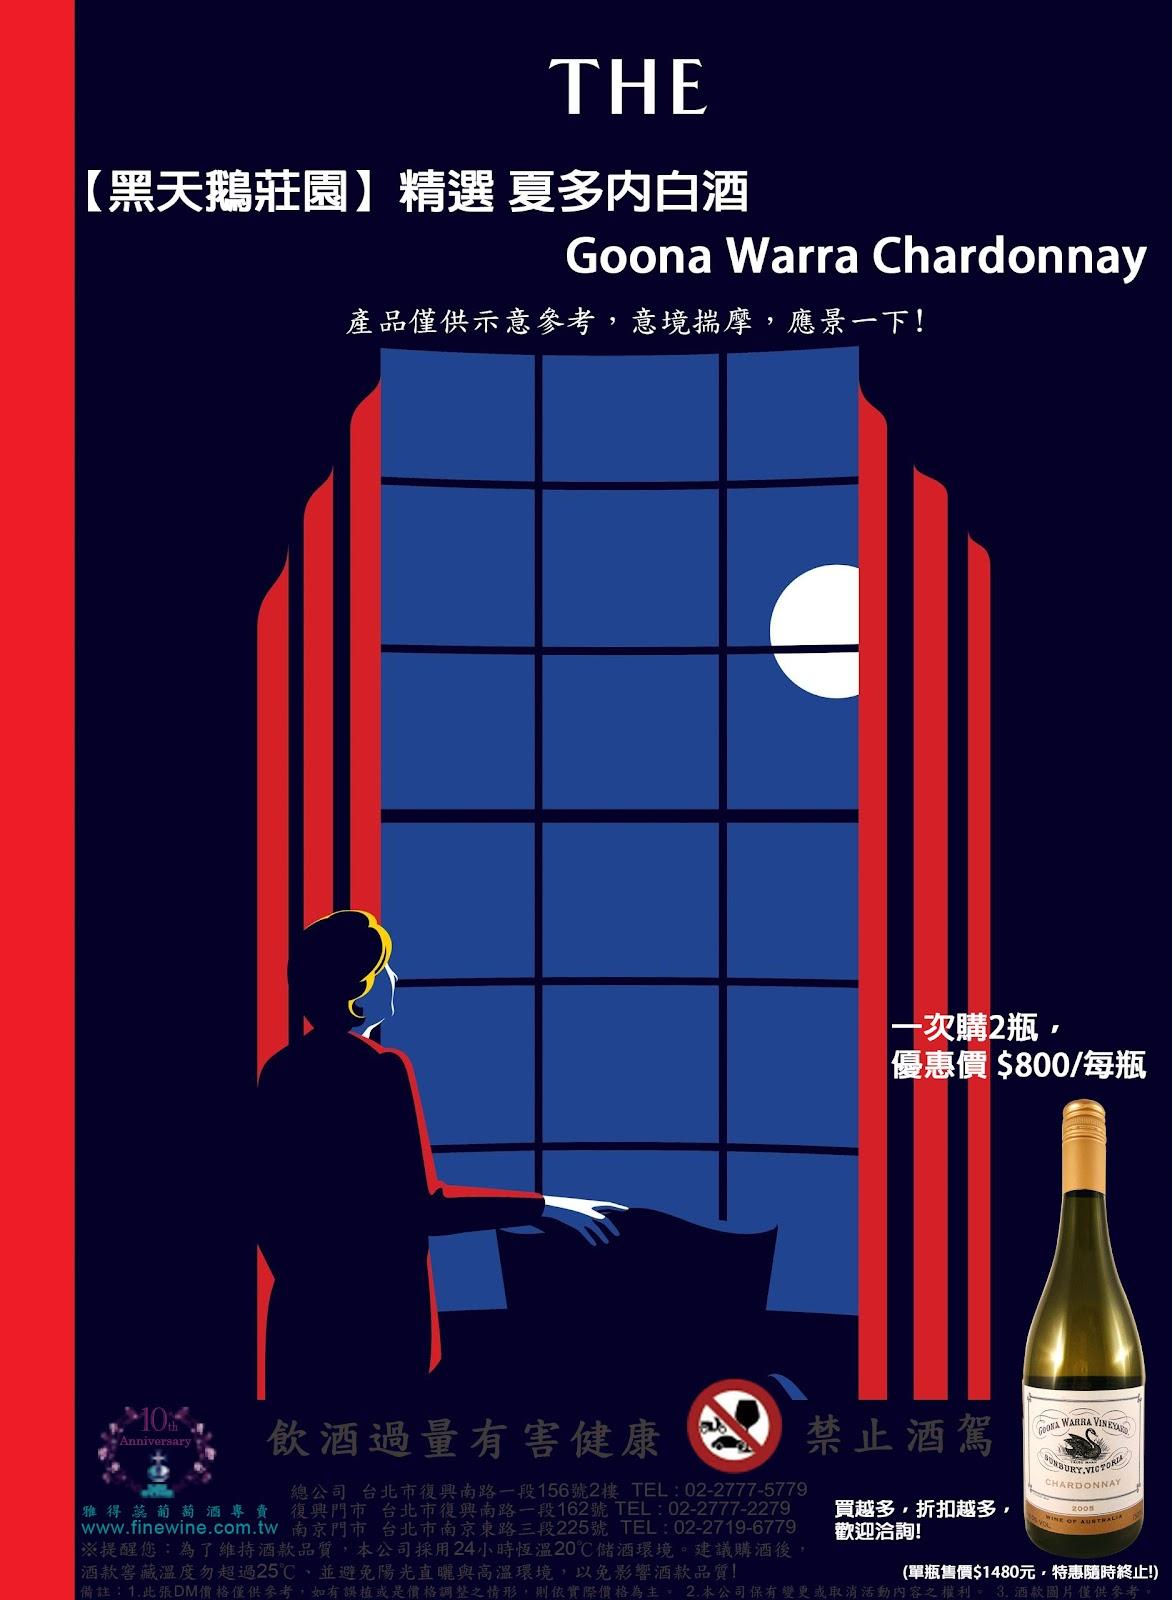 Hillary_Chardonnay Relax tip2017.jpg